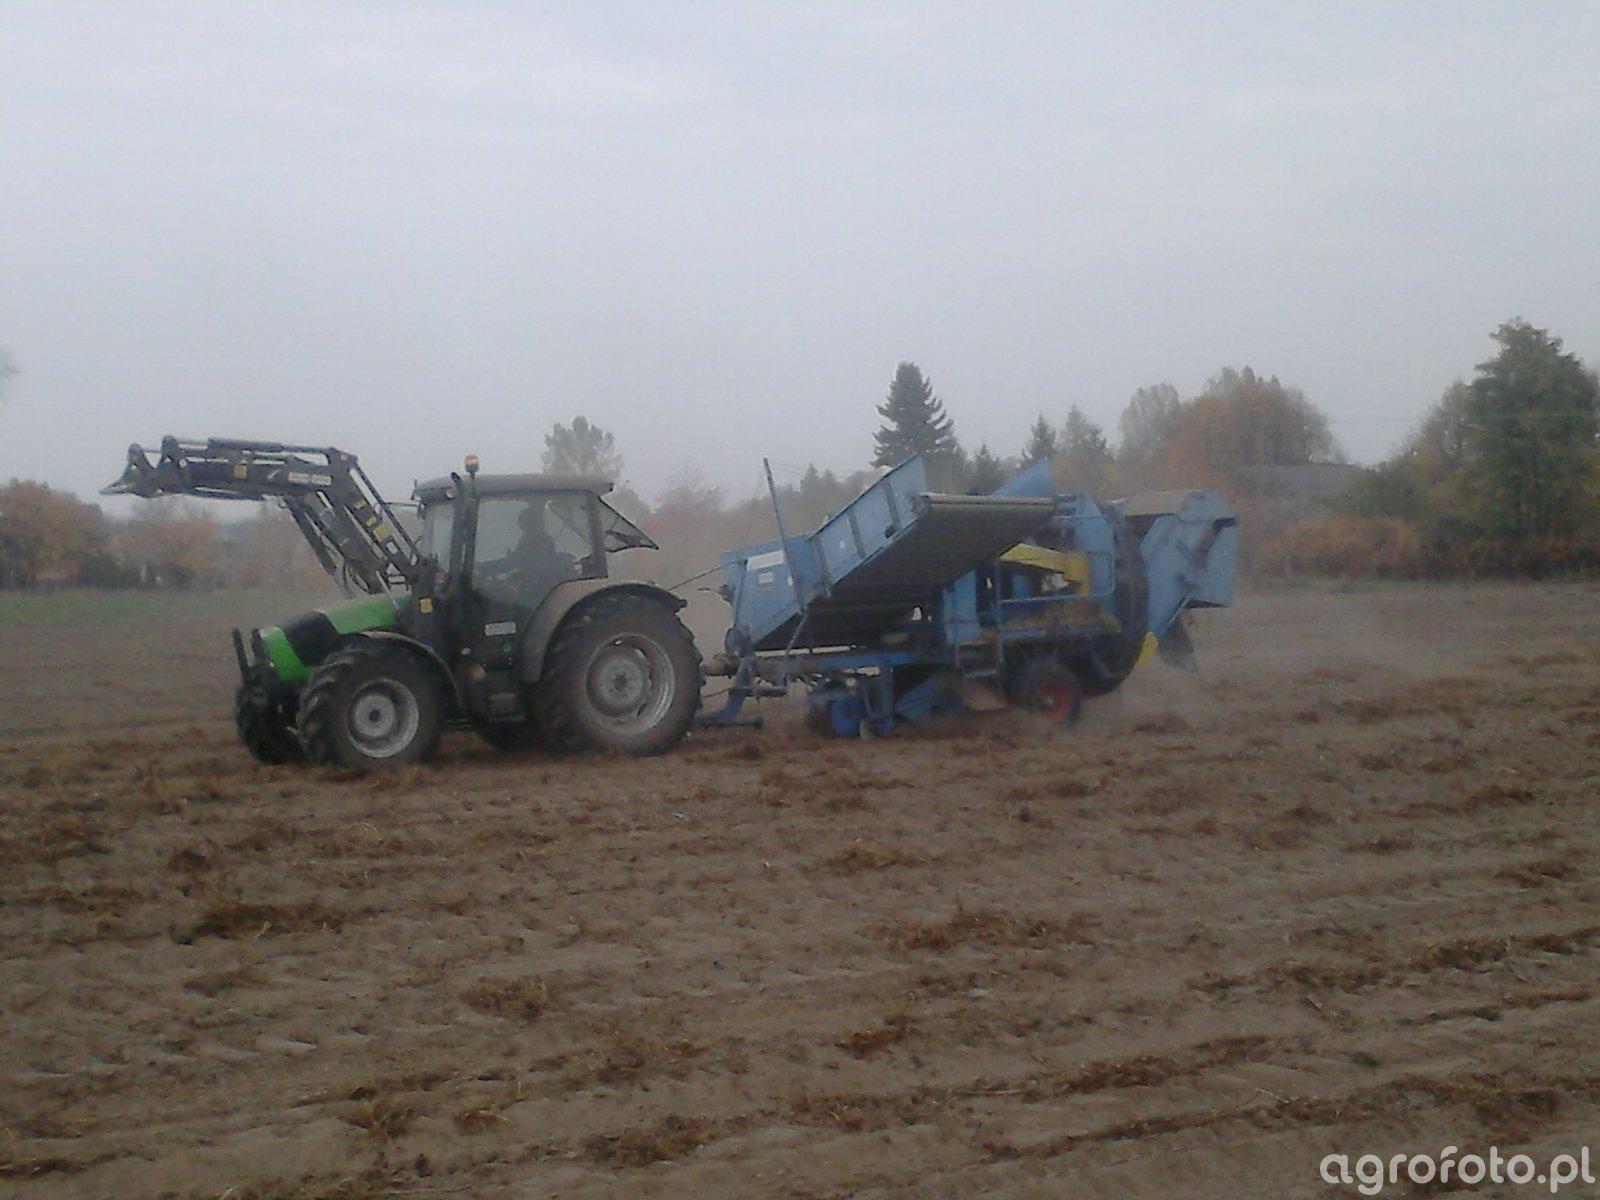 Deutz-Fahr Agrofarm 420 i Anna